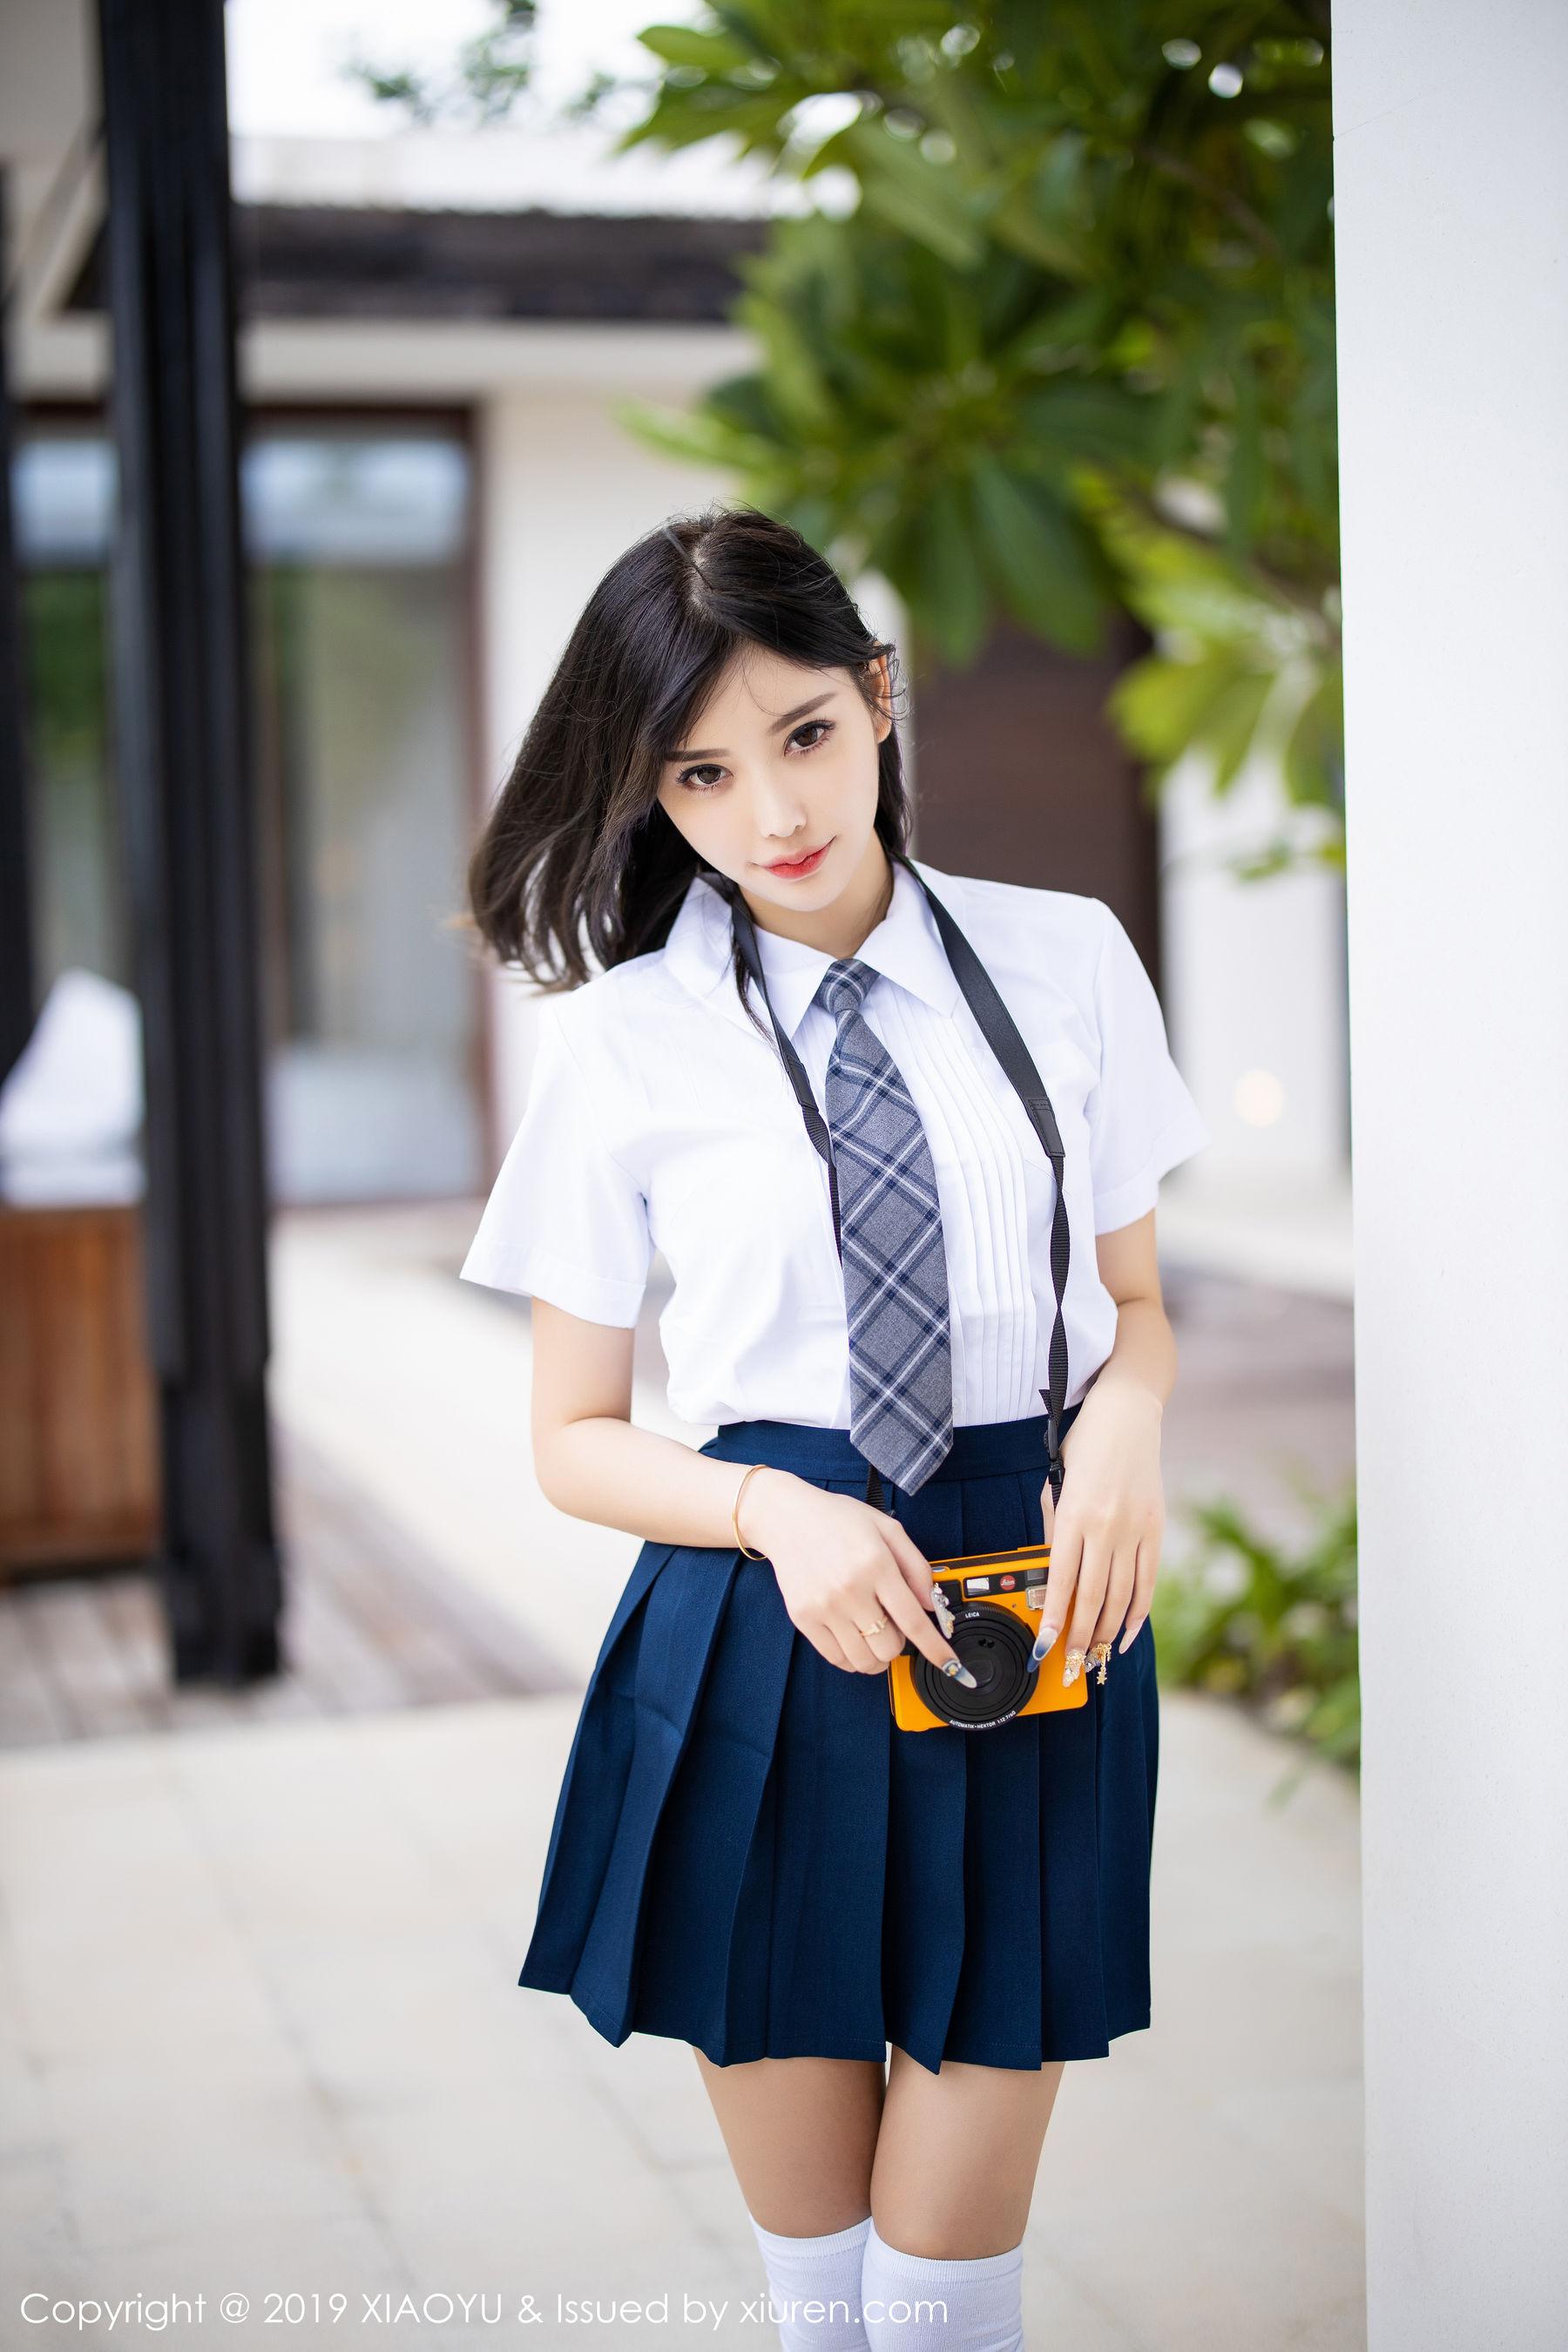 uniformc007